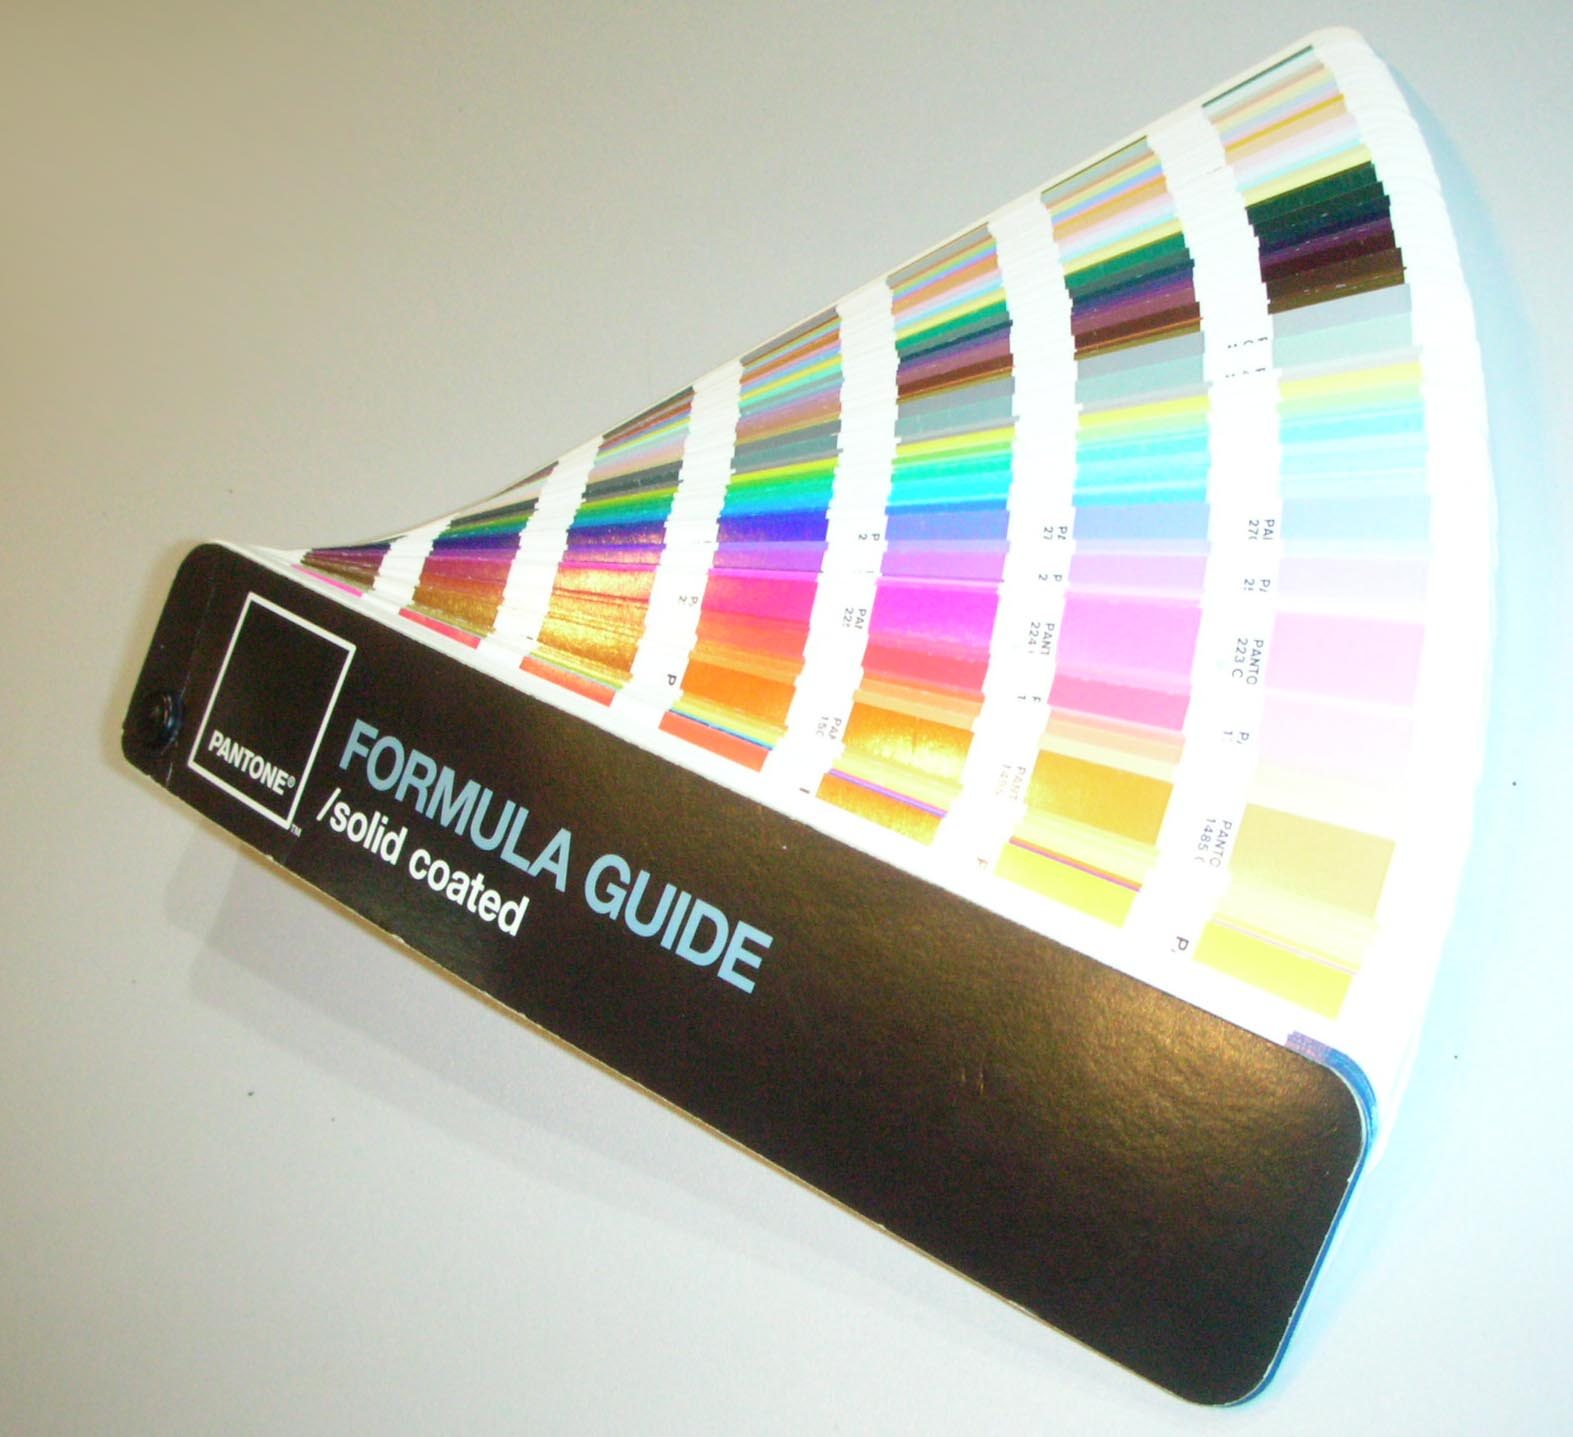 Pantone colour guide promotional products